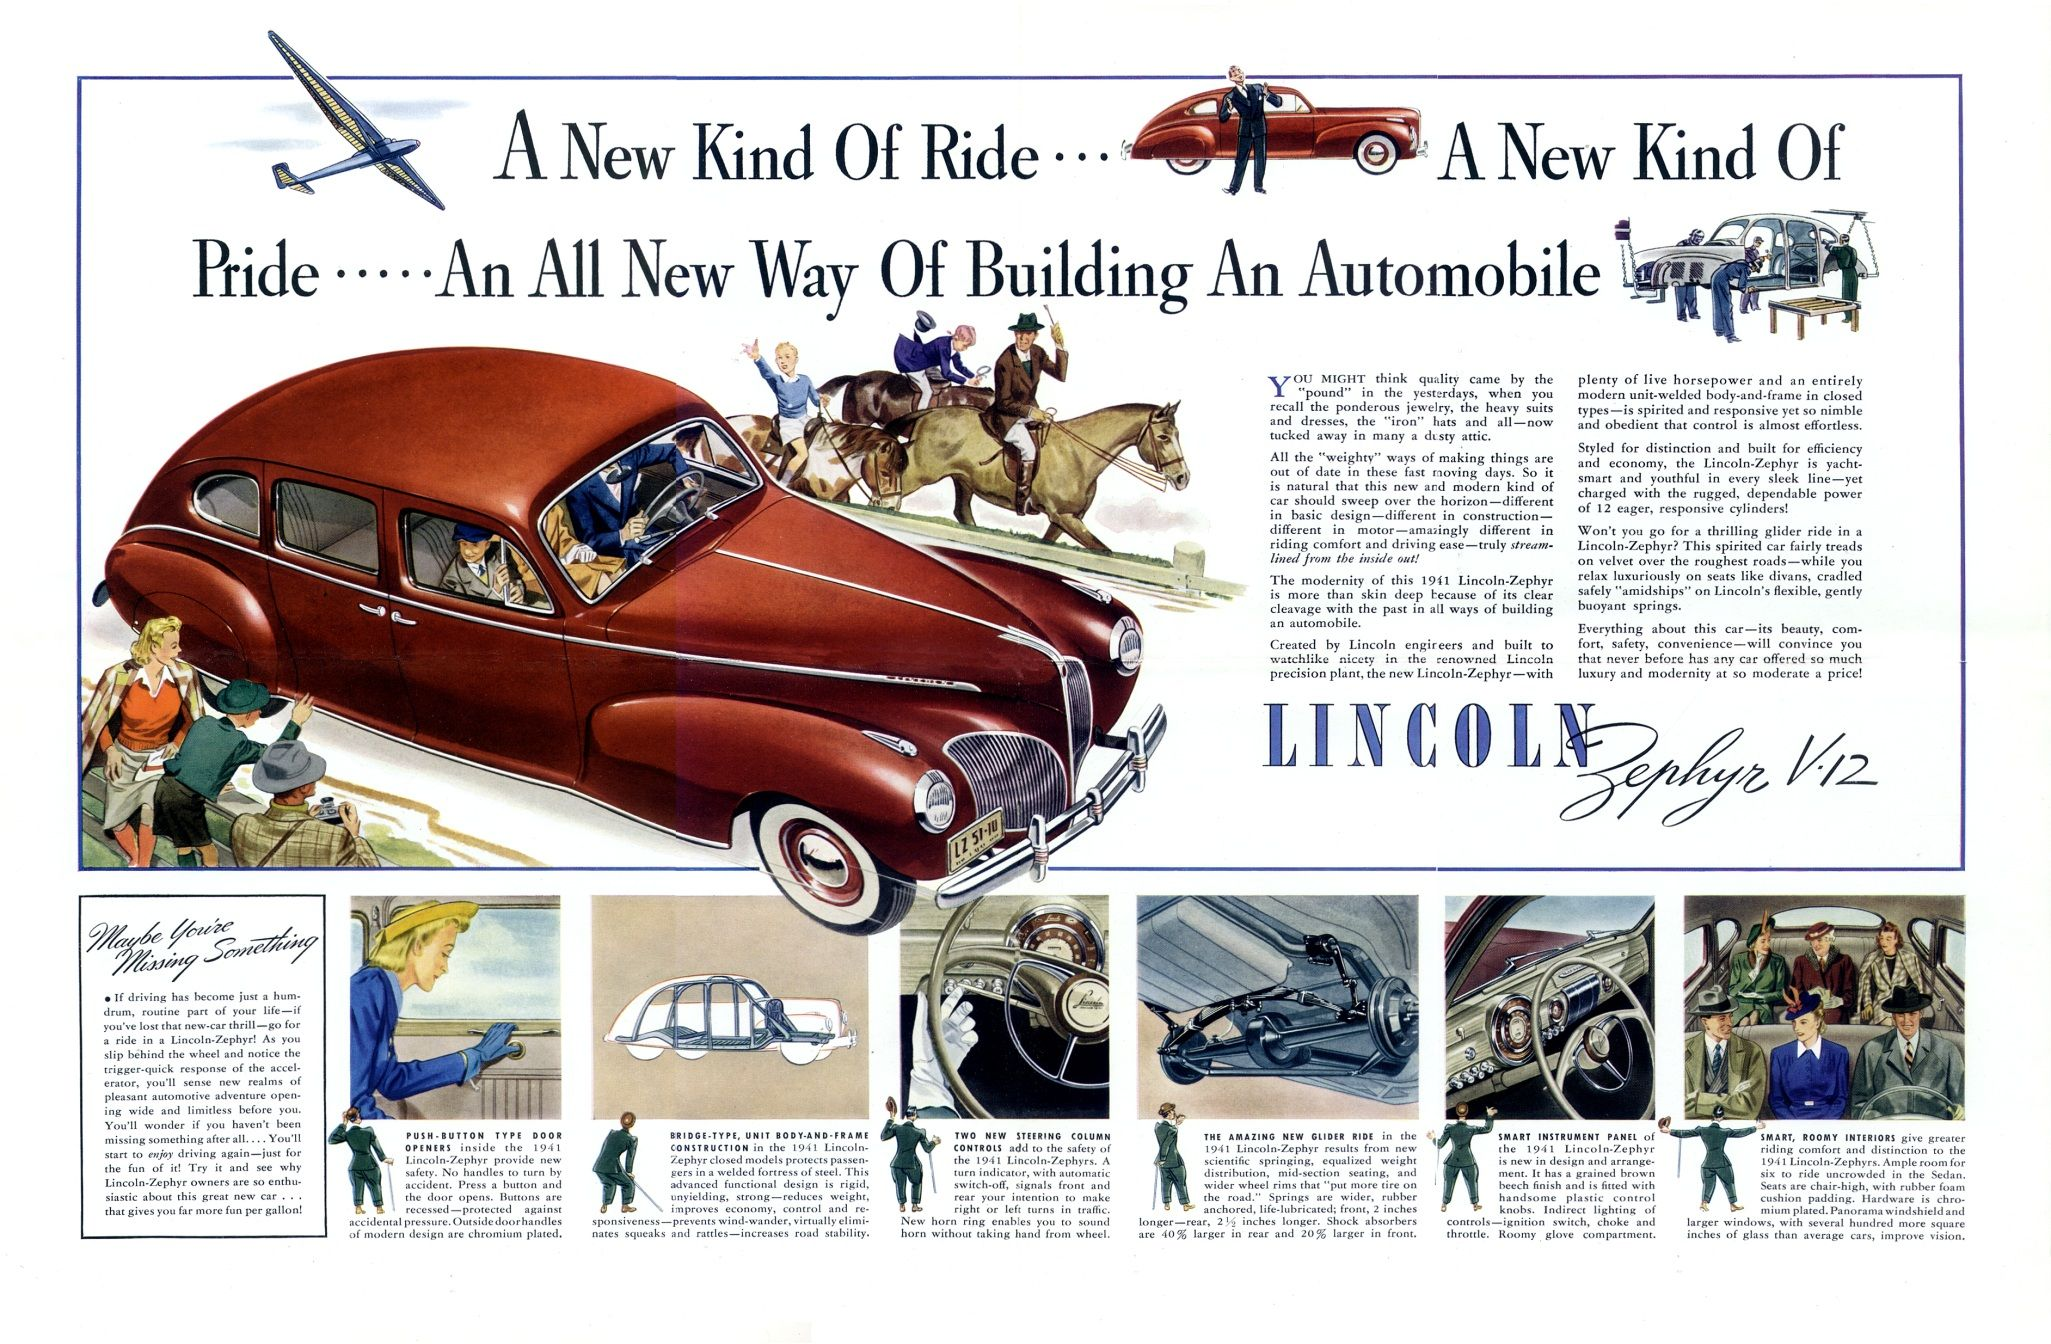 1941 Lincoln Zephyr Ad 01 Lincoln Zephyr Lincoln Lincoln Motor